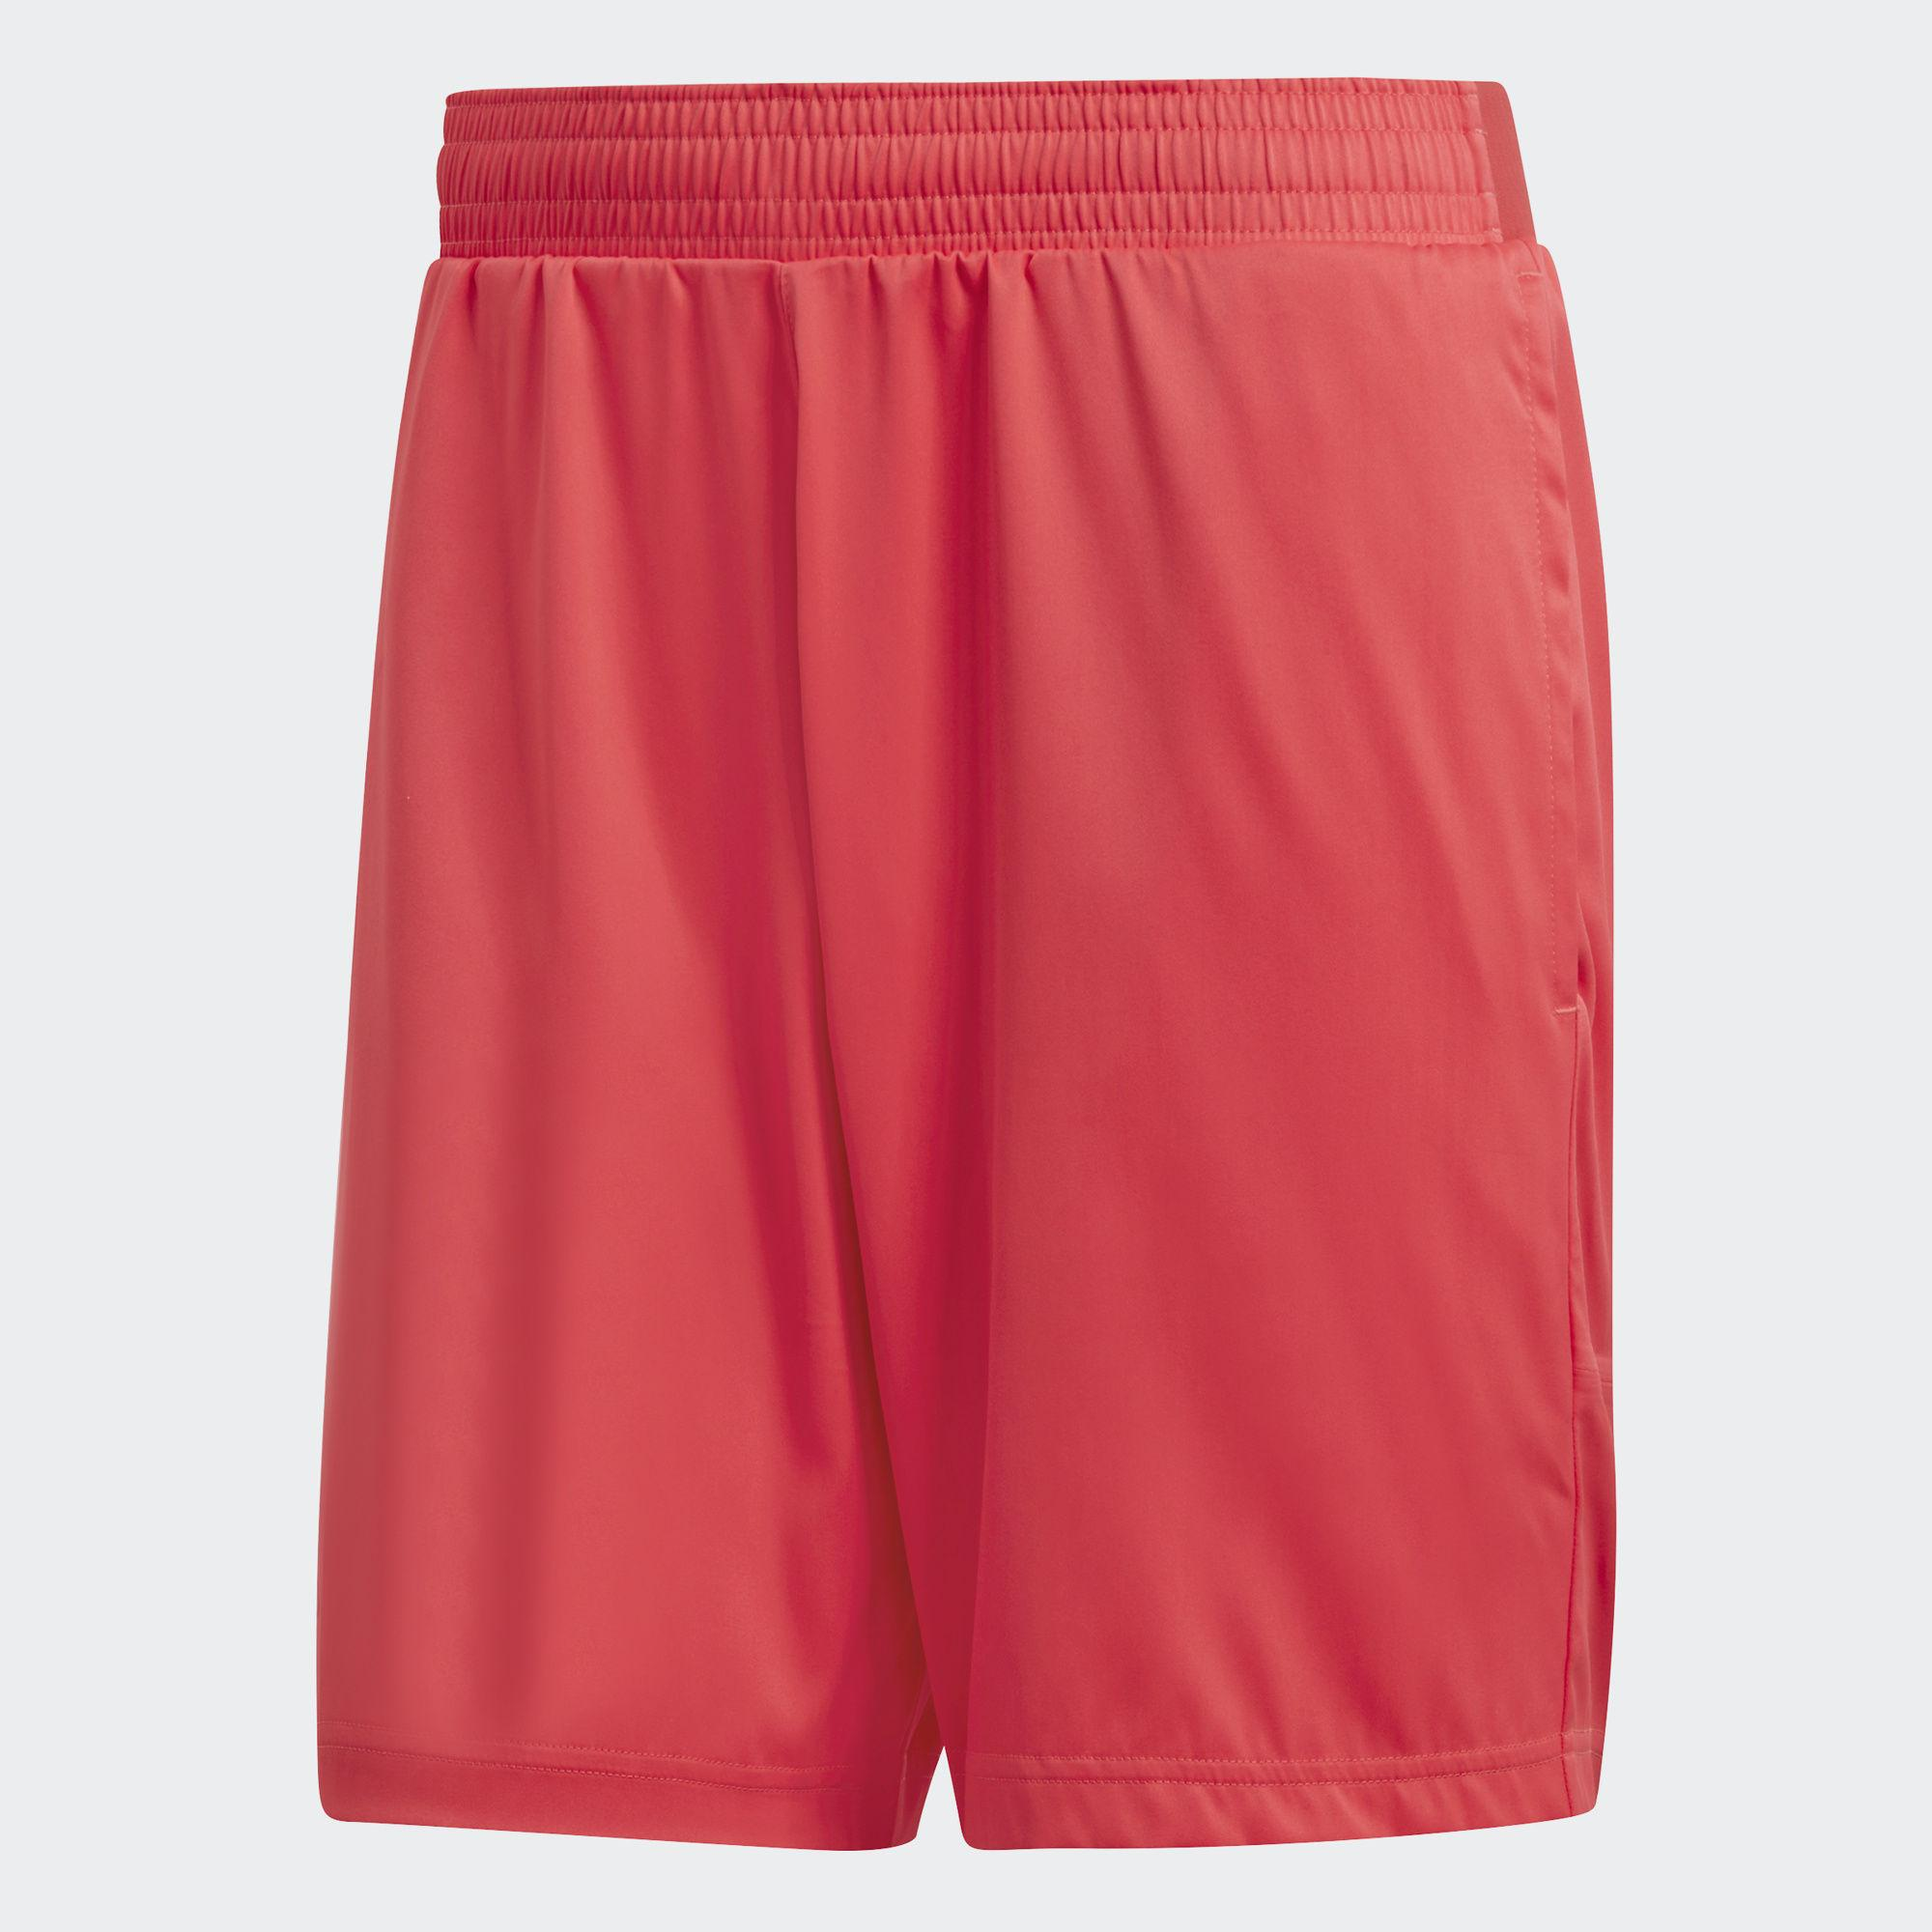 Tennis clothes adidas ID Crew tennis socks (whiteblack